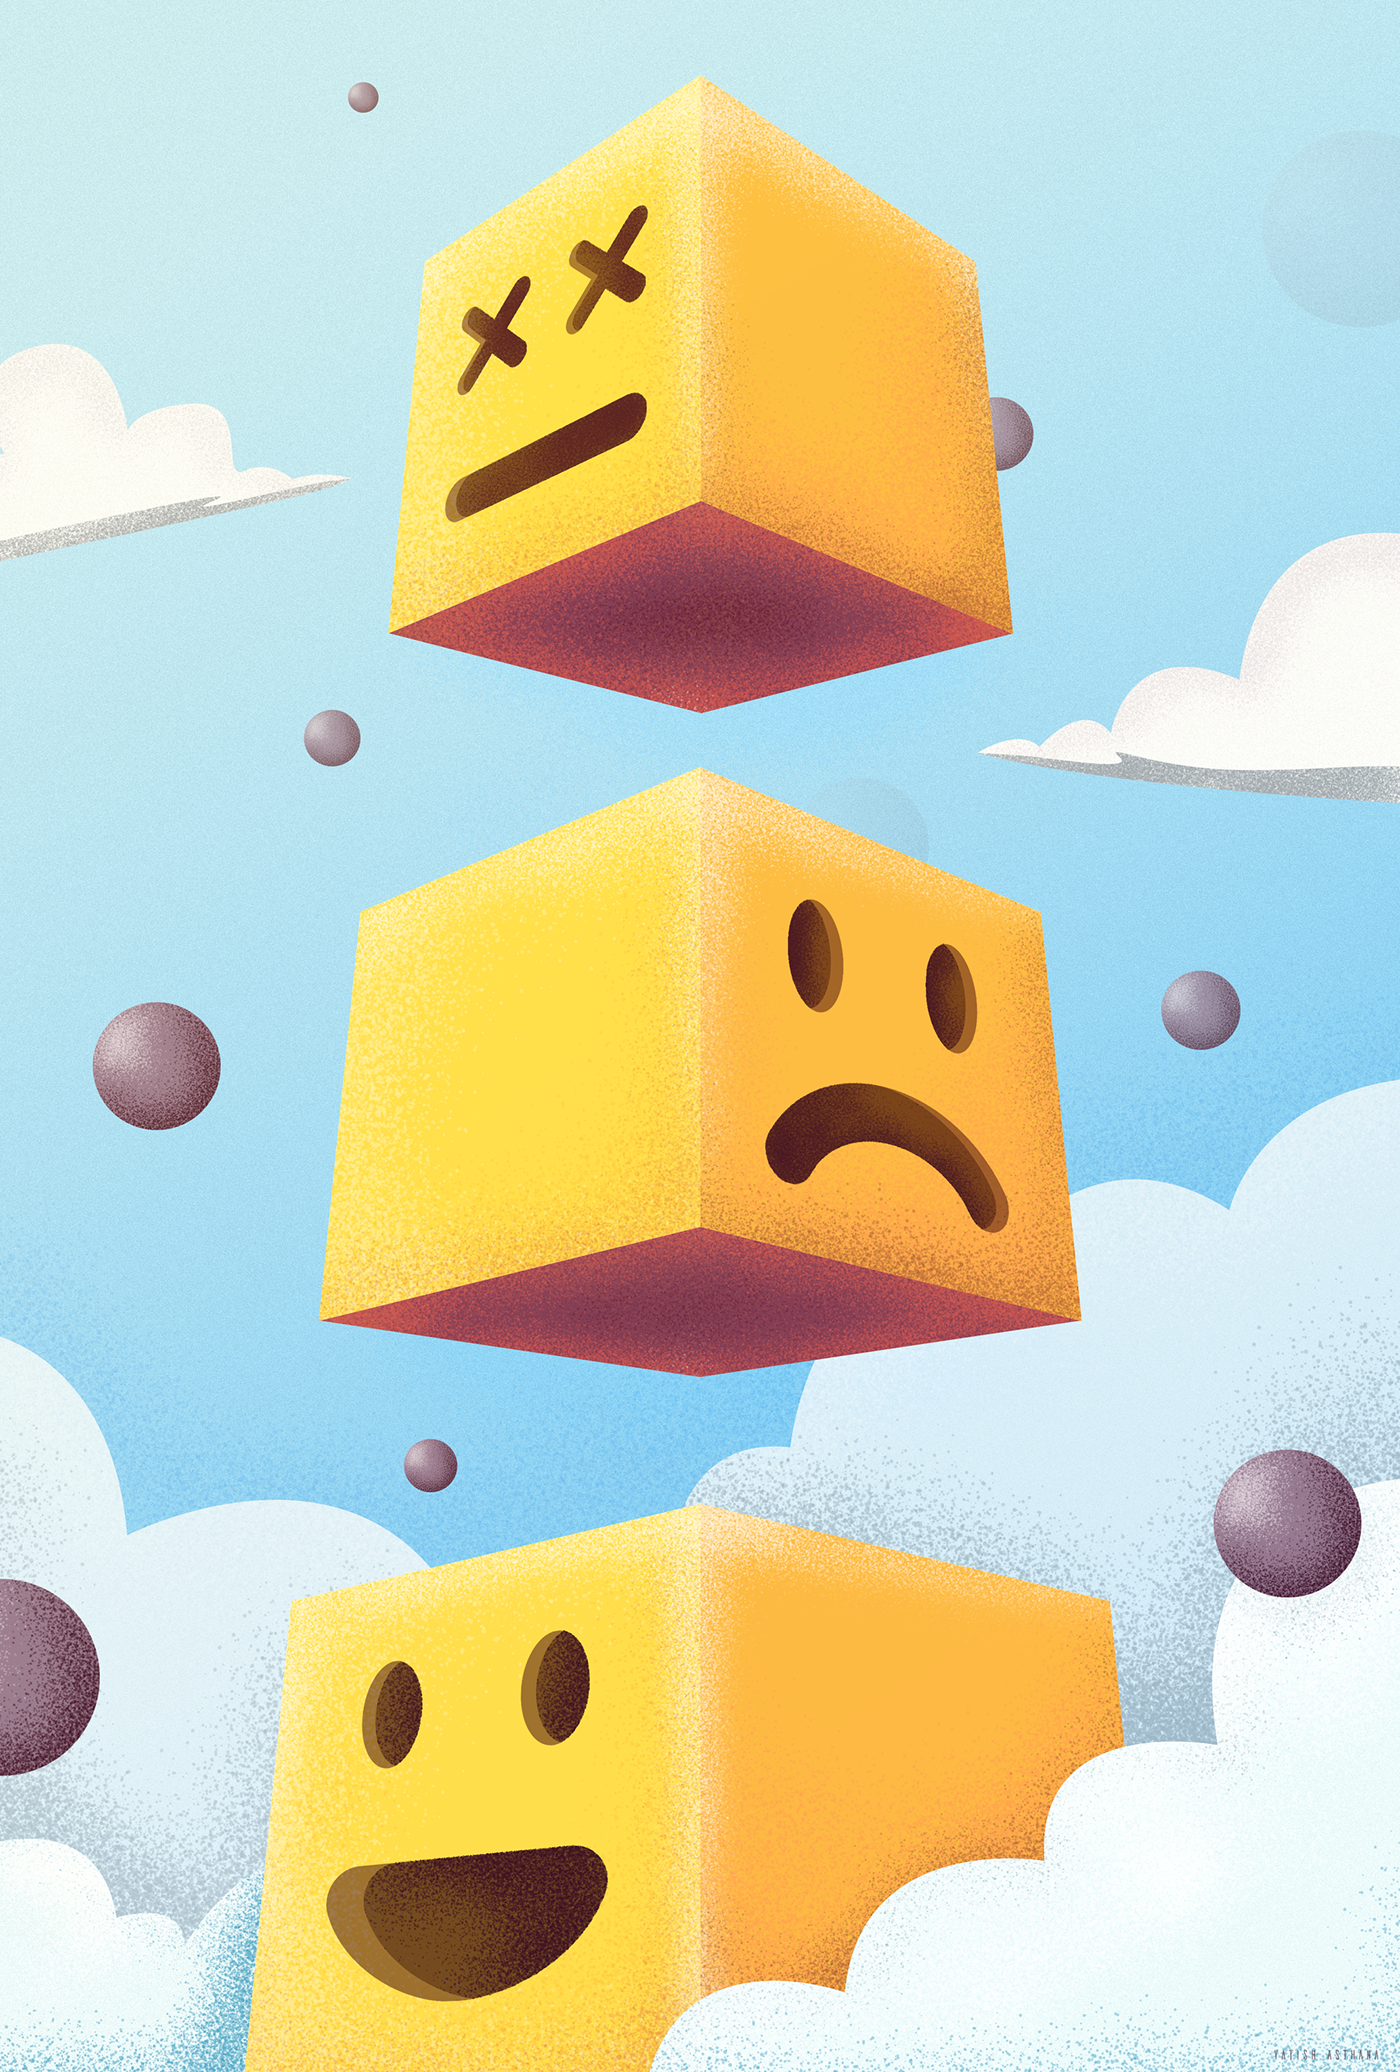 Level video game LEGO concept art Emoji yatish asthana India poster minimal SKY